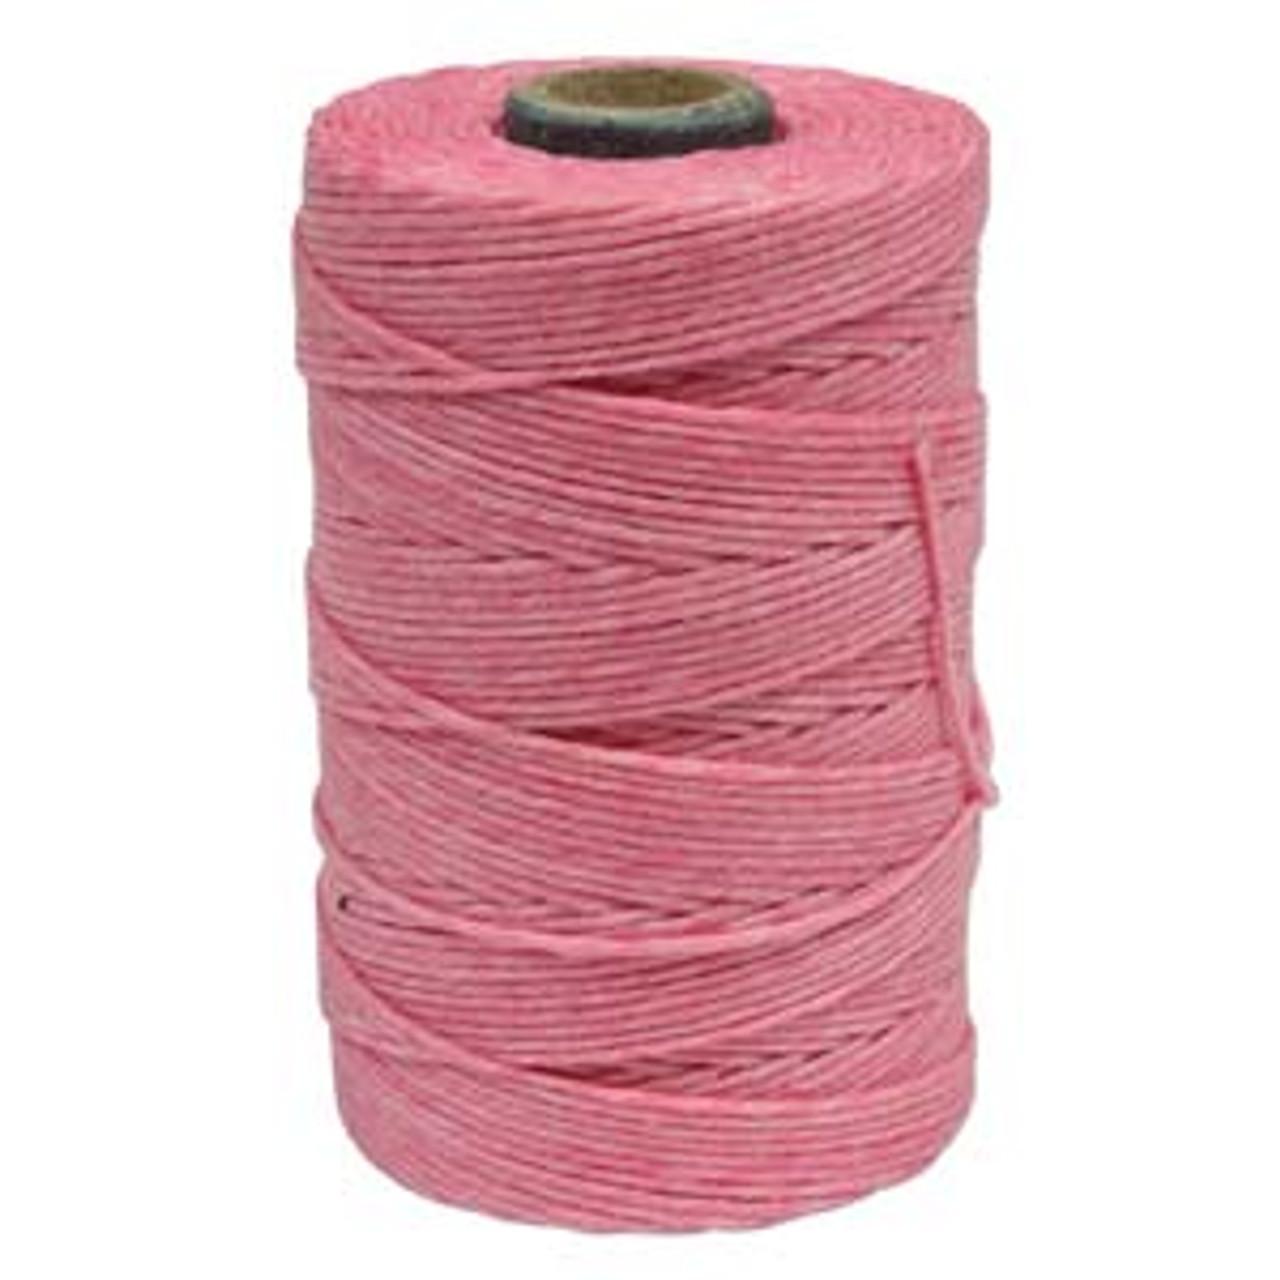 Light Rose 4ply Irish Waxed Linen (10 Yards)